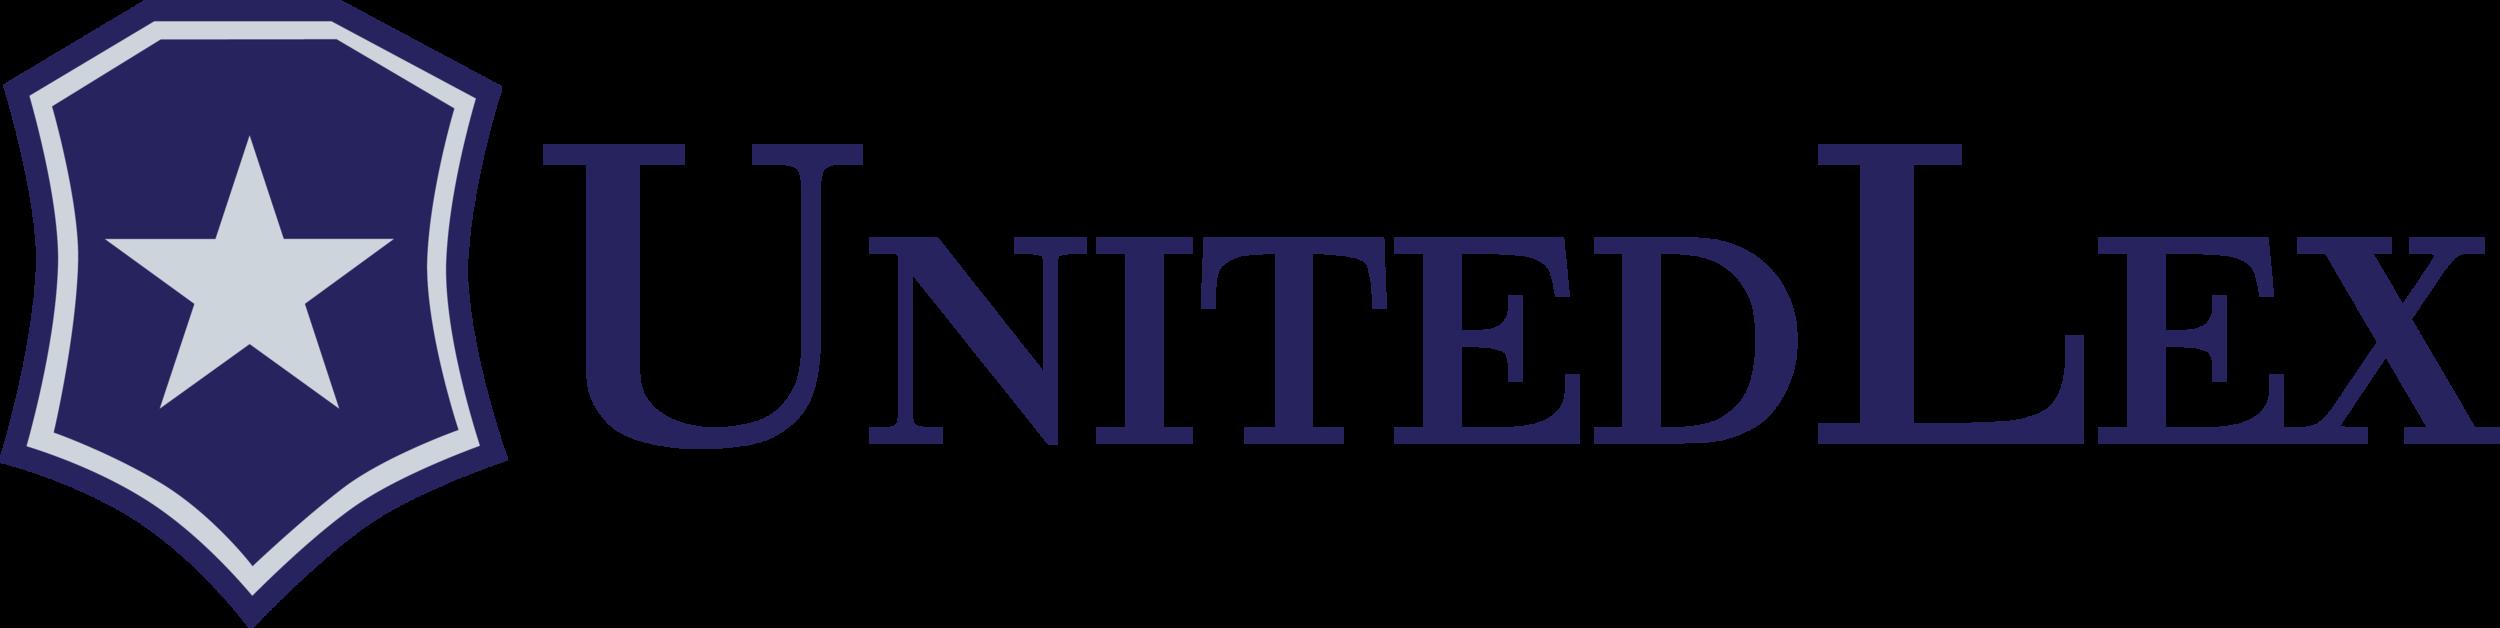 UnitedLex-logo-Final 2.png